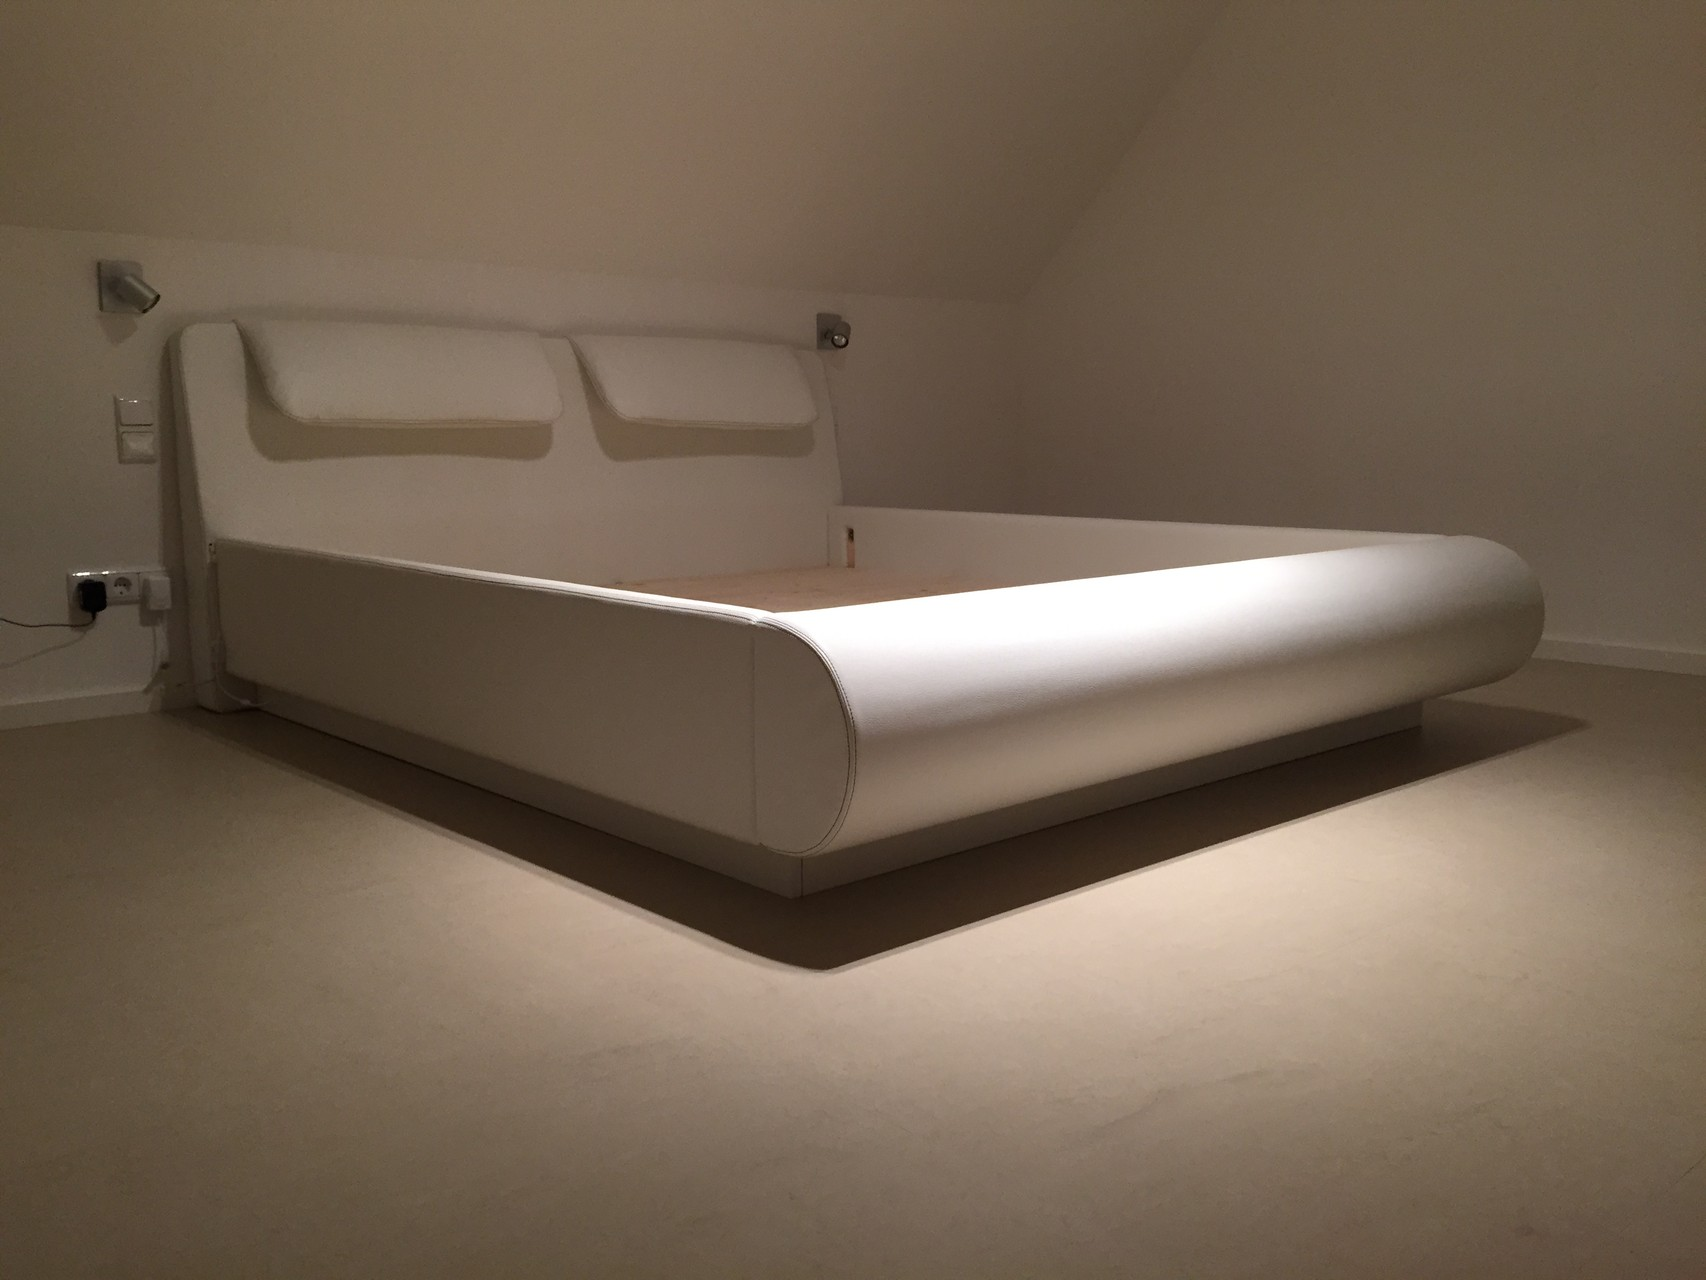 Sonderanfertigung- Bett nach Kundenwunsch bezogen